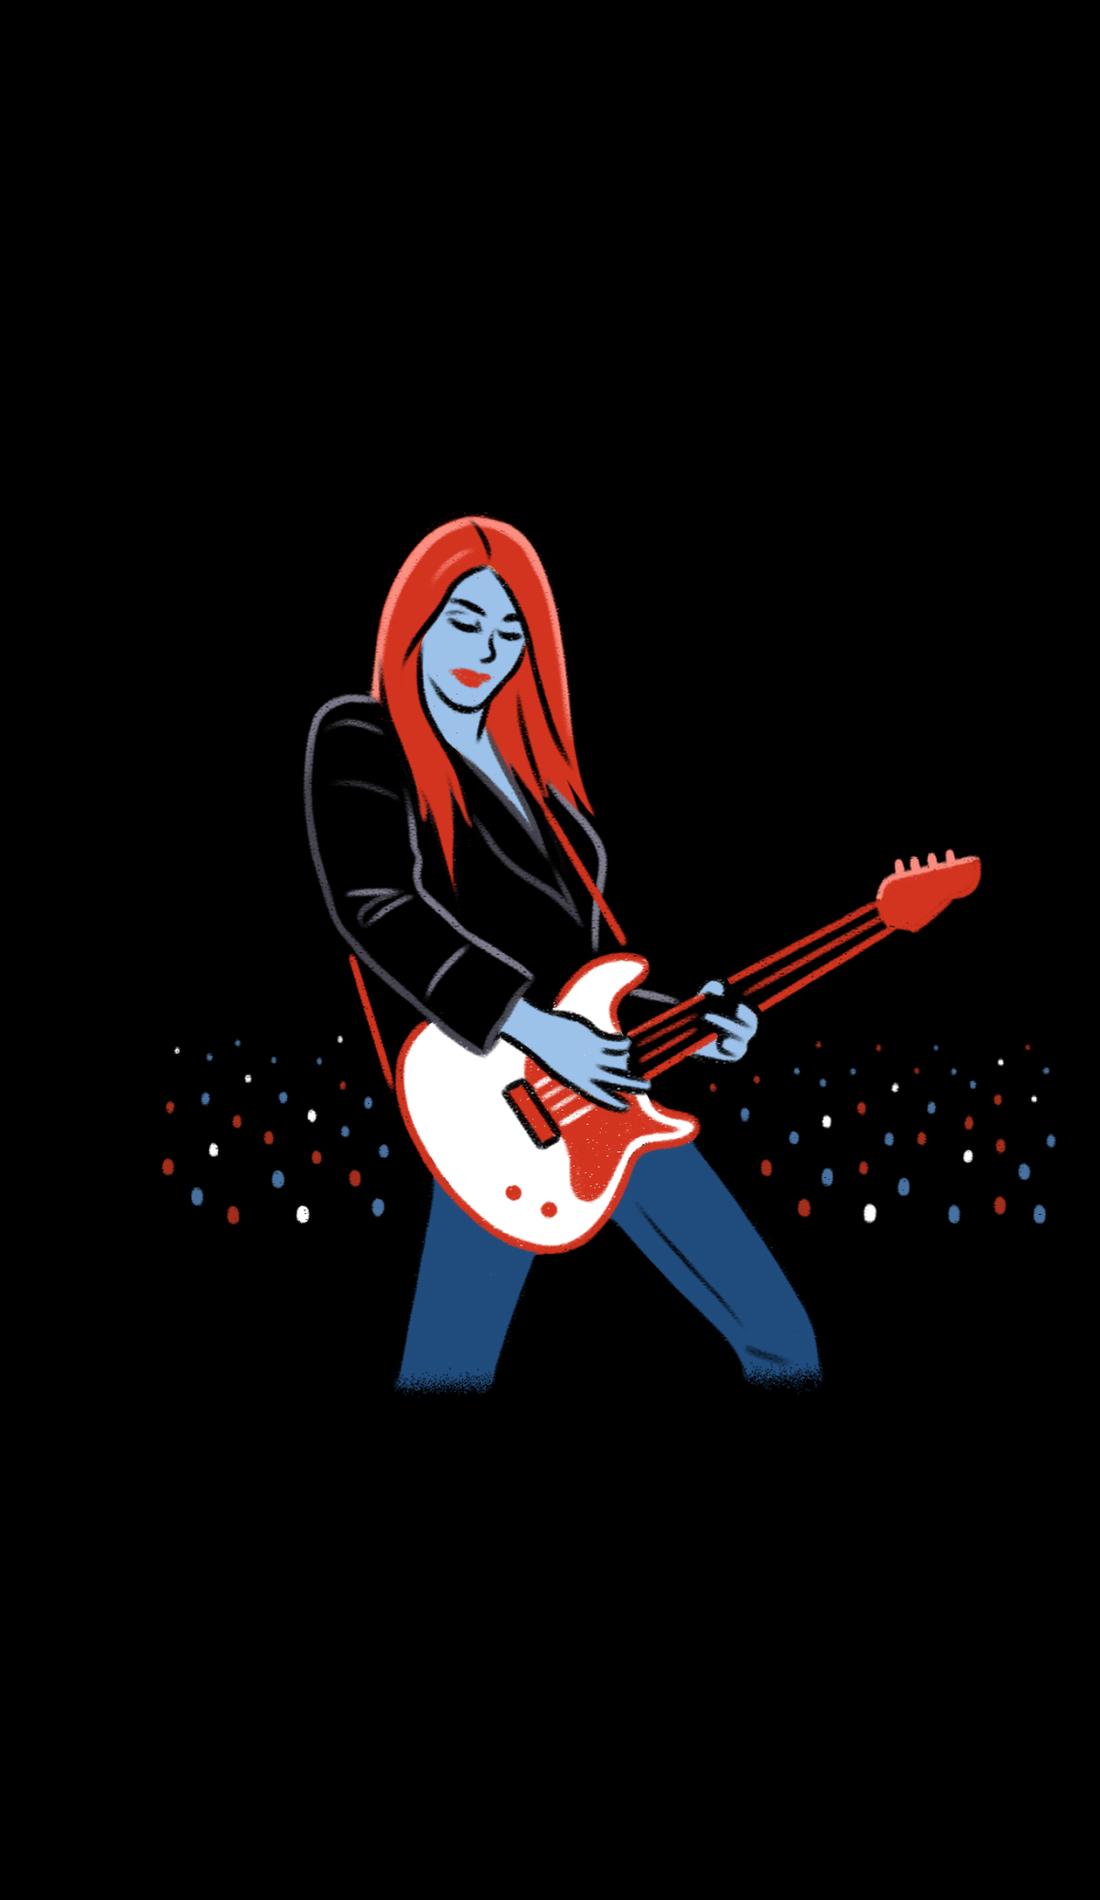 A DJ Pierre live event